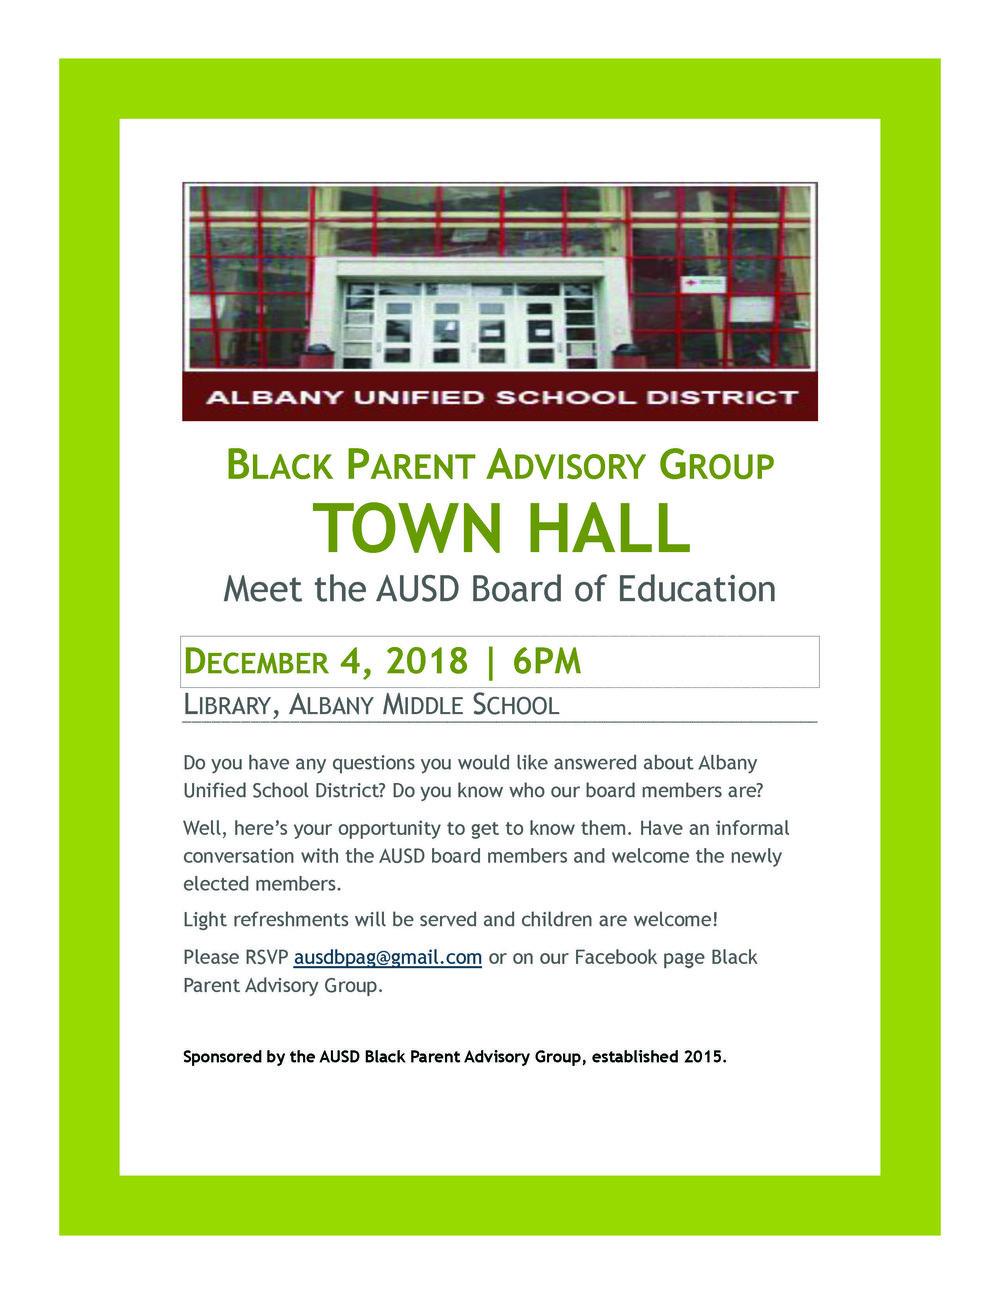 BPAG Town Hall flyer.jpg